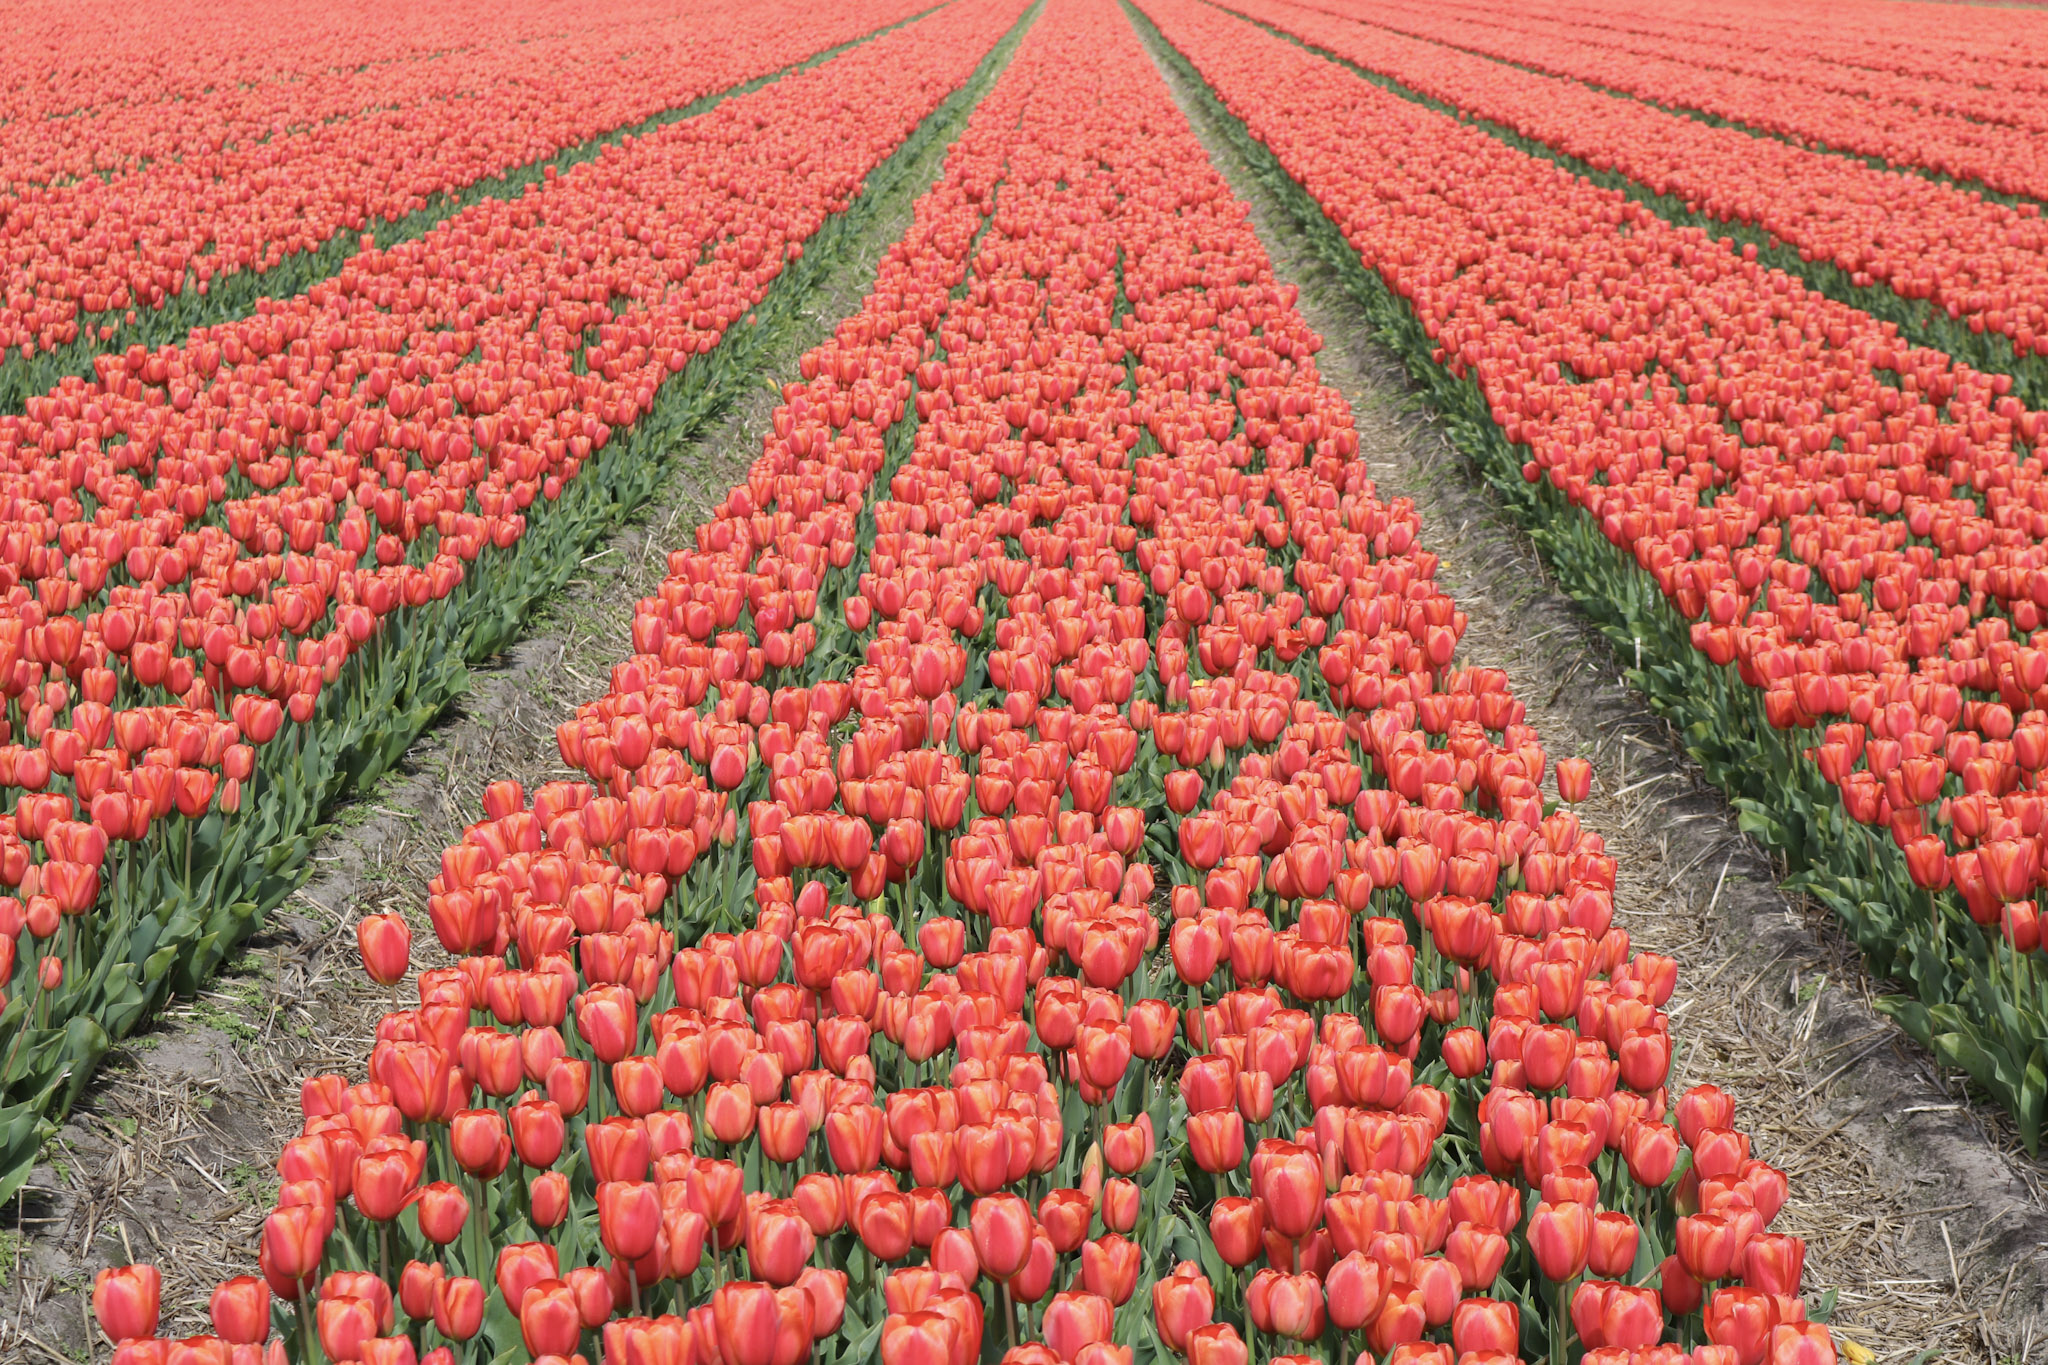 Kilometers of tulips!